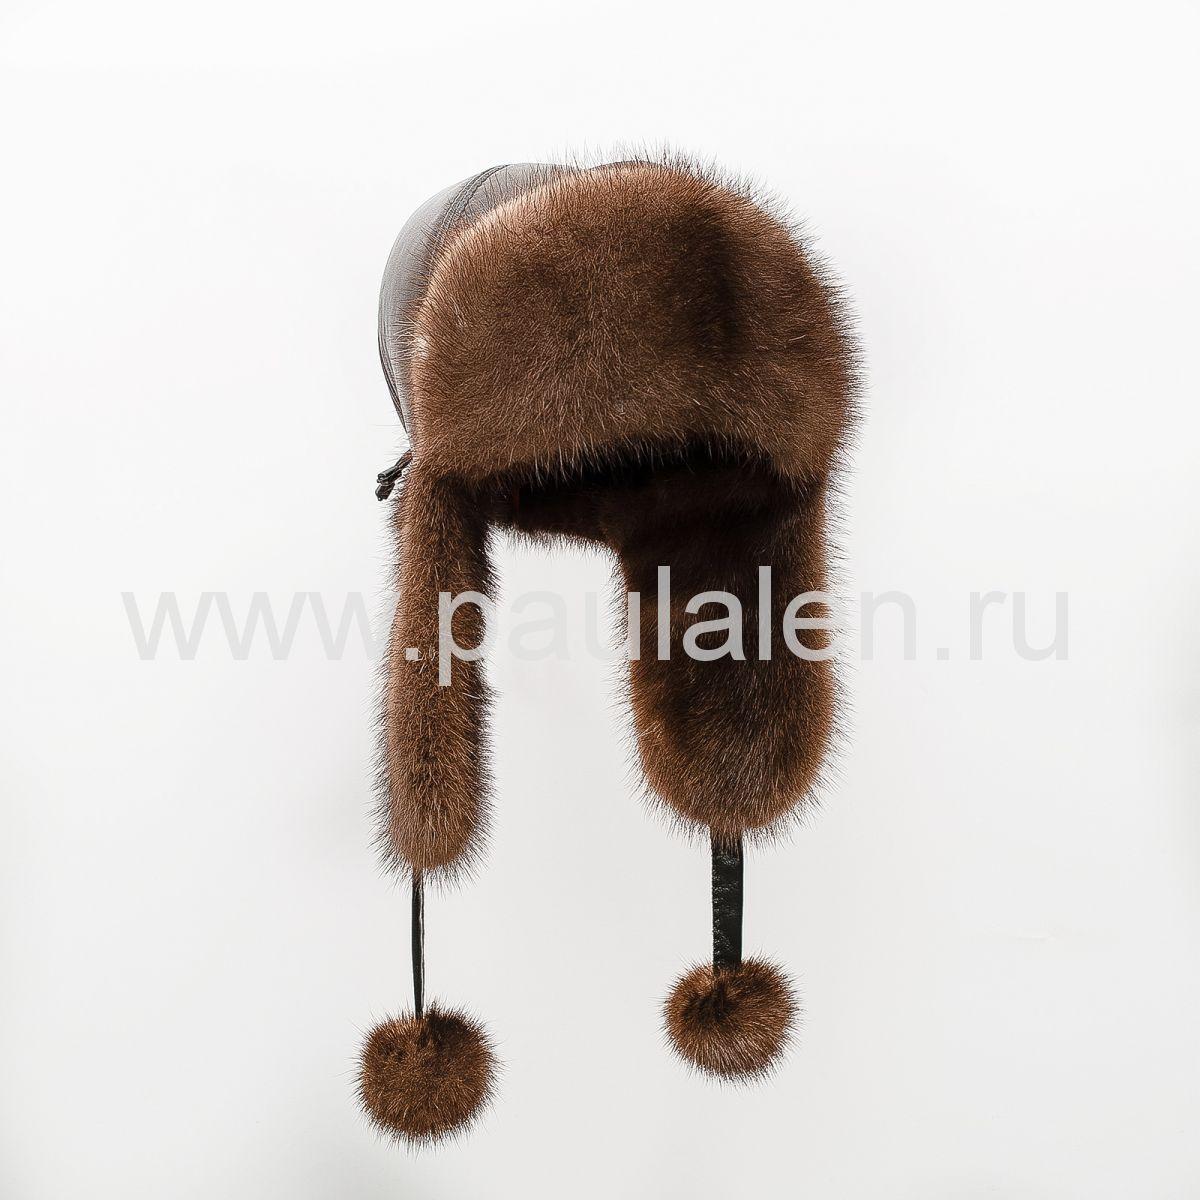 Женская норковая шапка ушанка с помпонами. Артикул A012_O